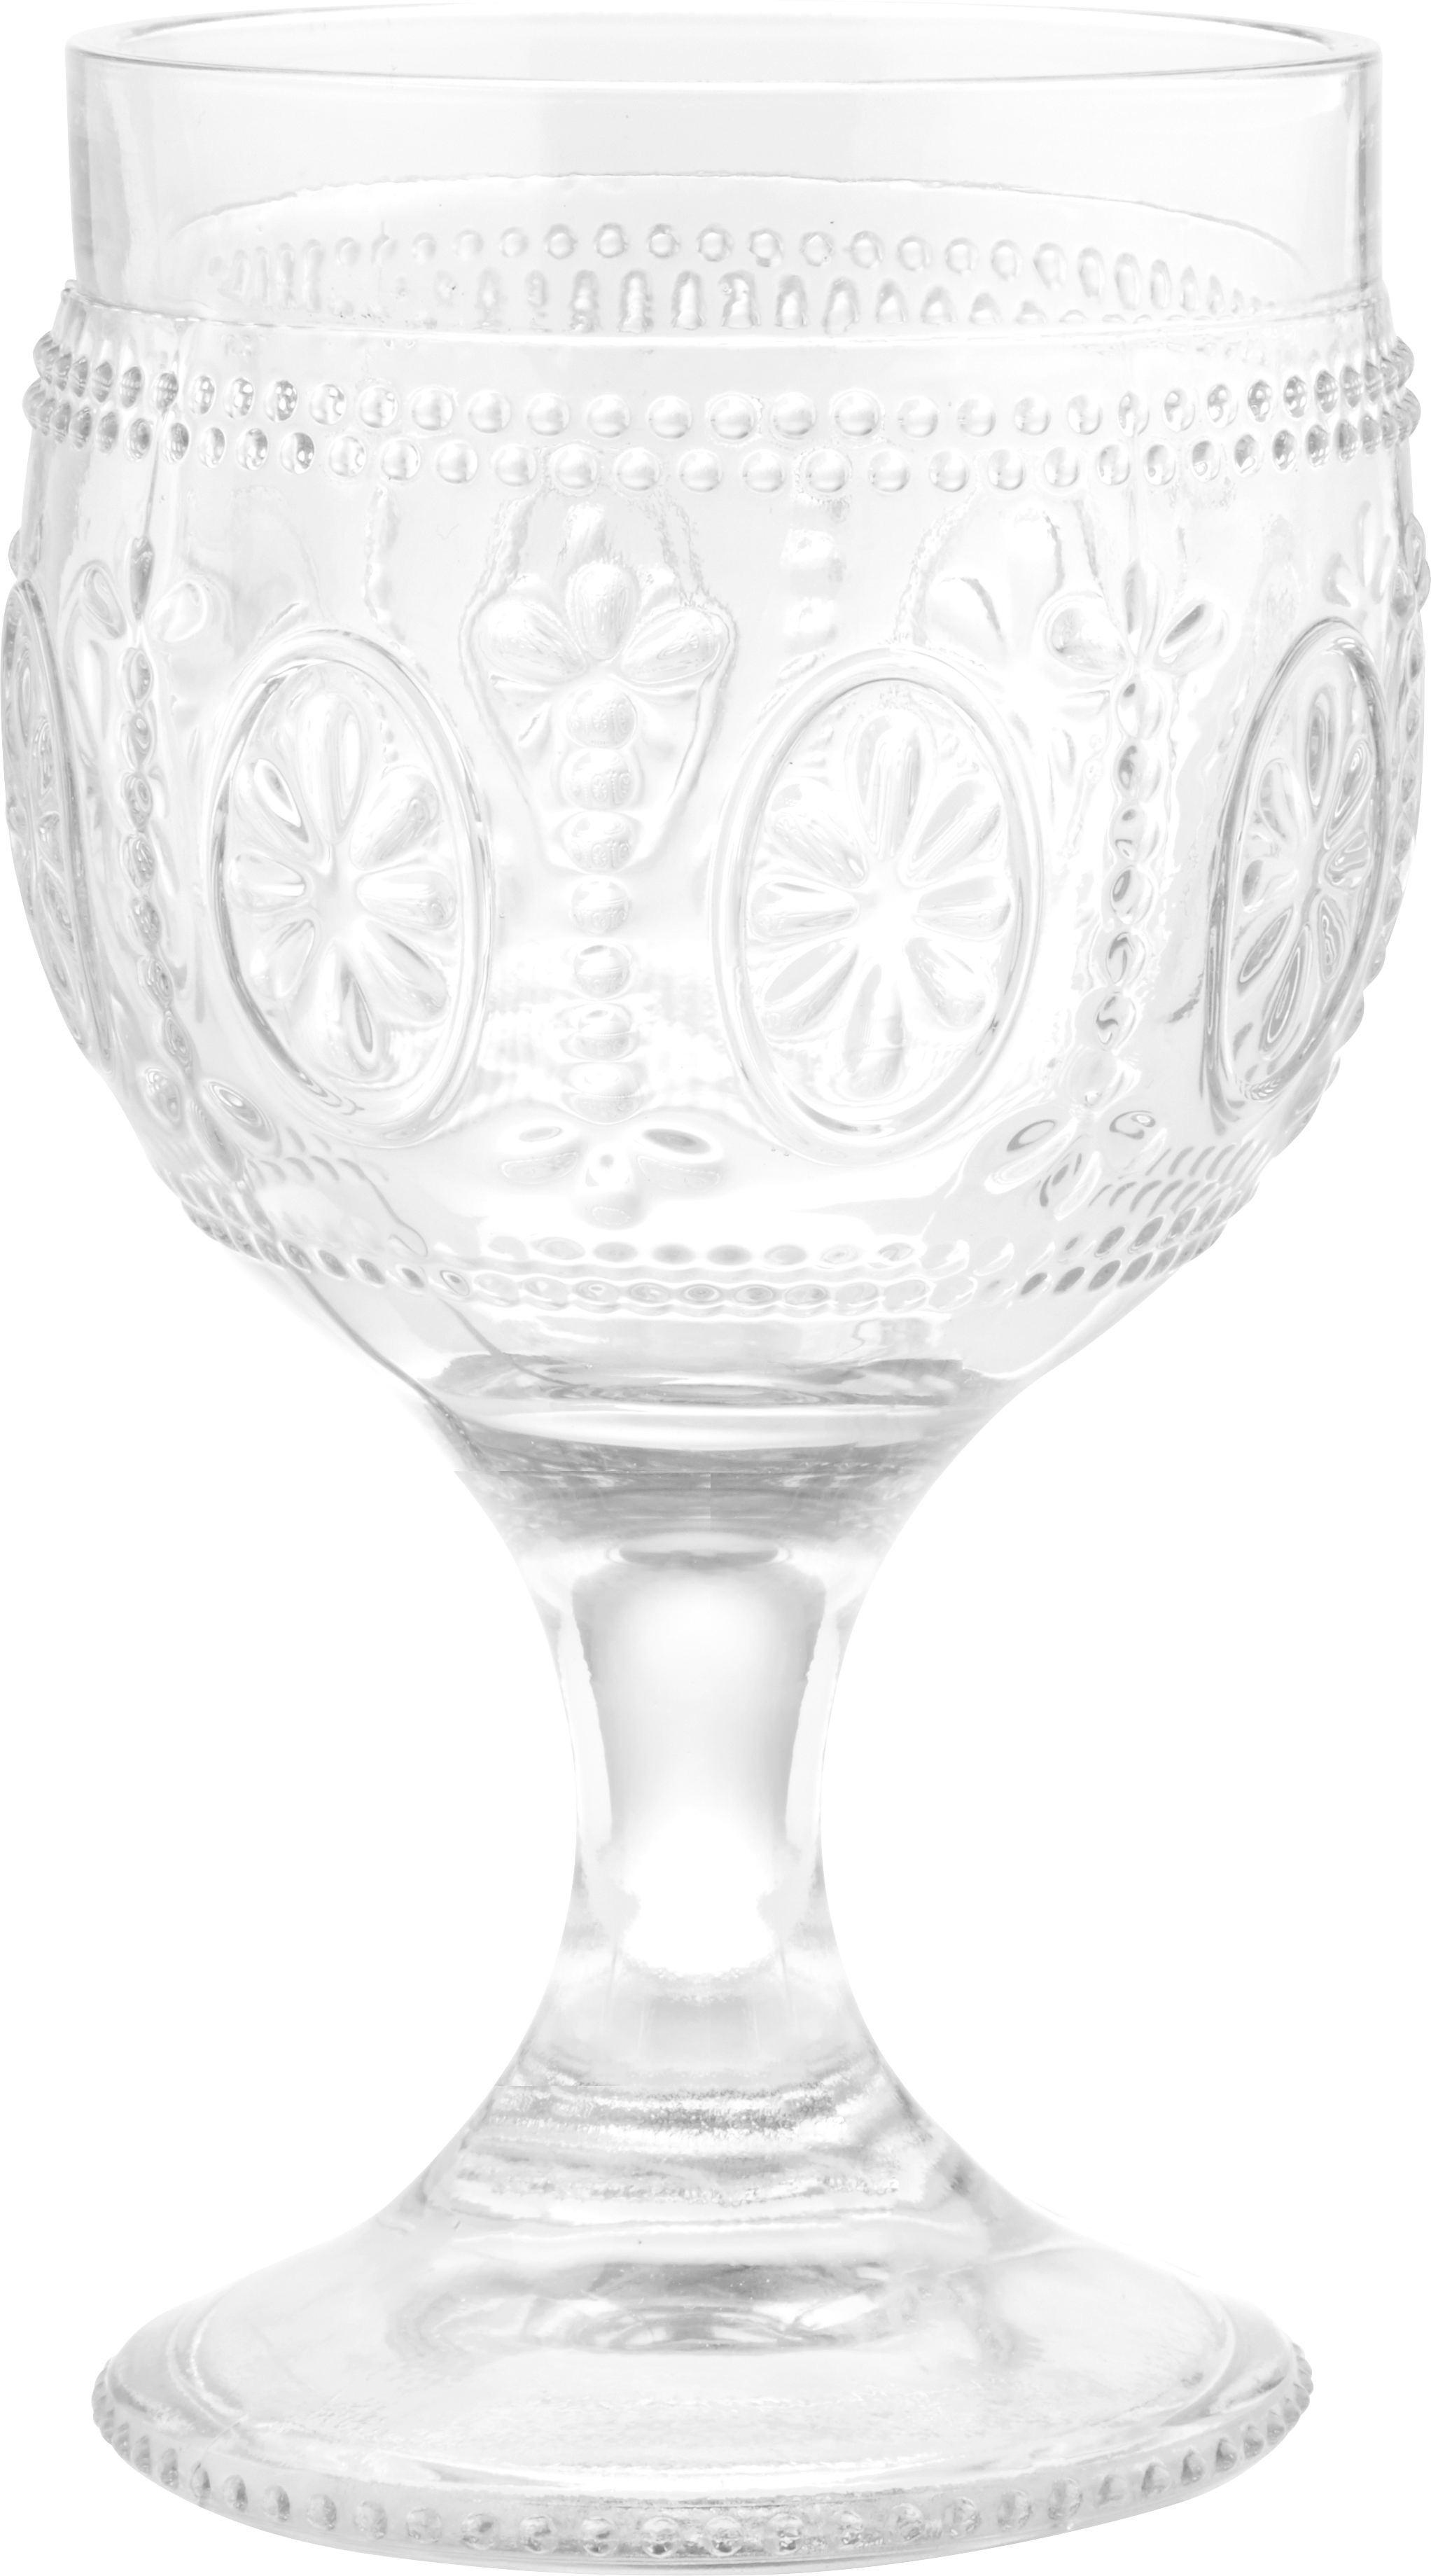 Rotweinglas St. Remy aus Glas, ca. 240ml - Klar, ROMANTIK / LANDHAUS, Glas (8,5/15cm) - MÖMAX modern living